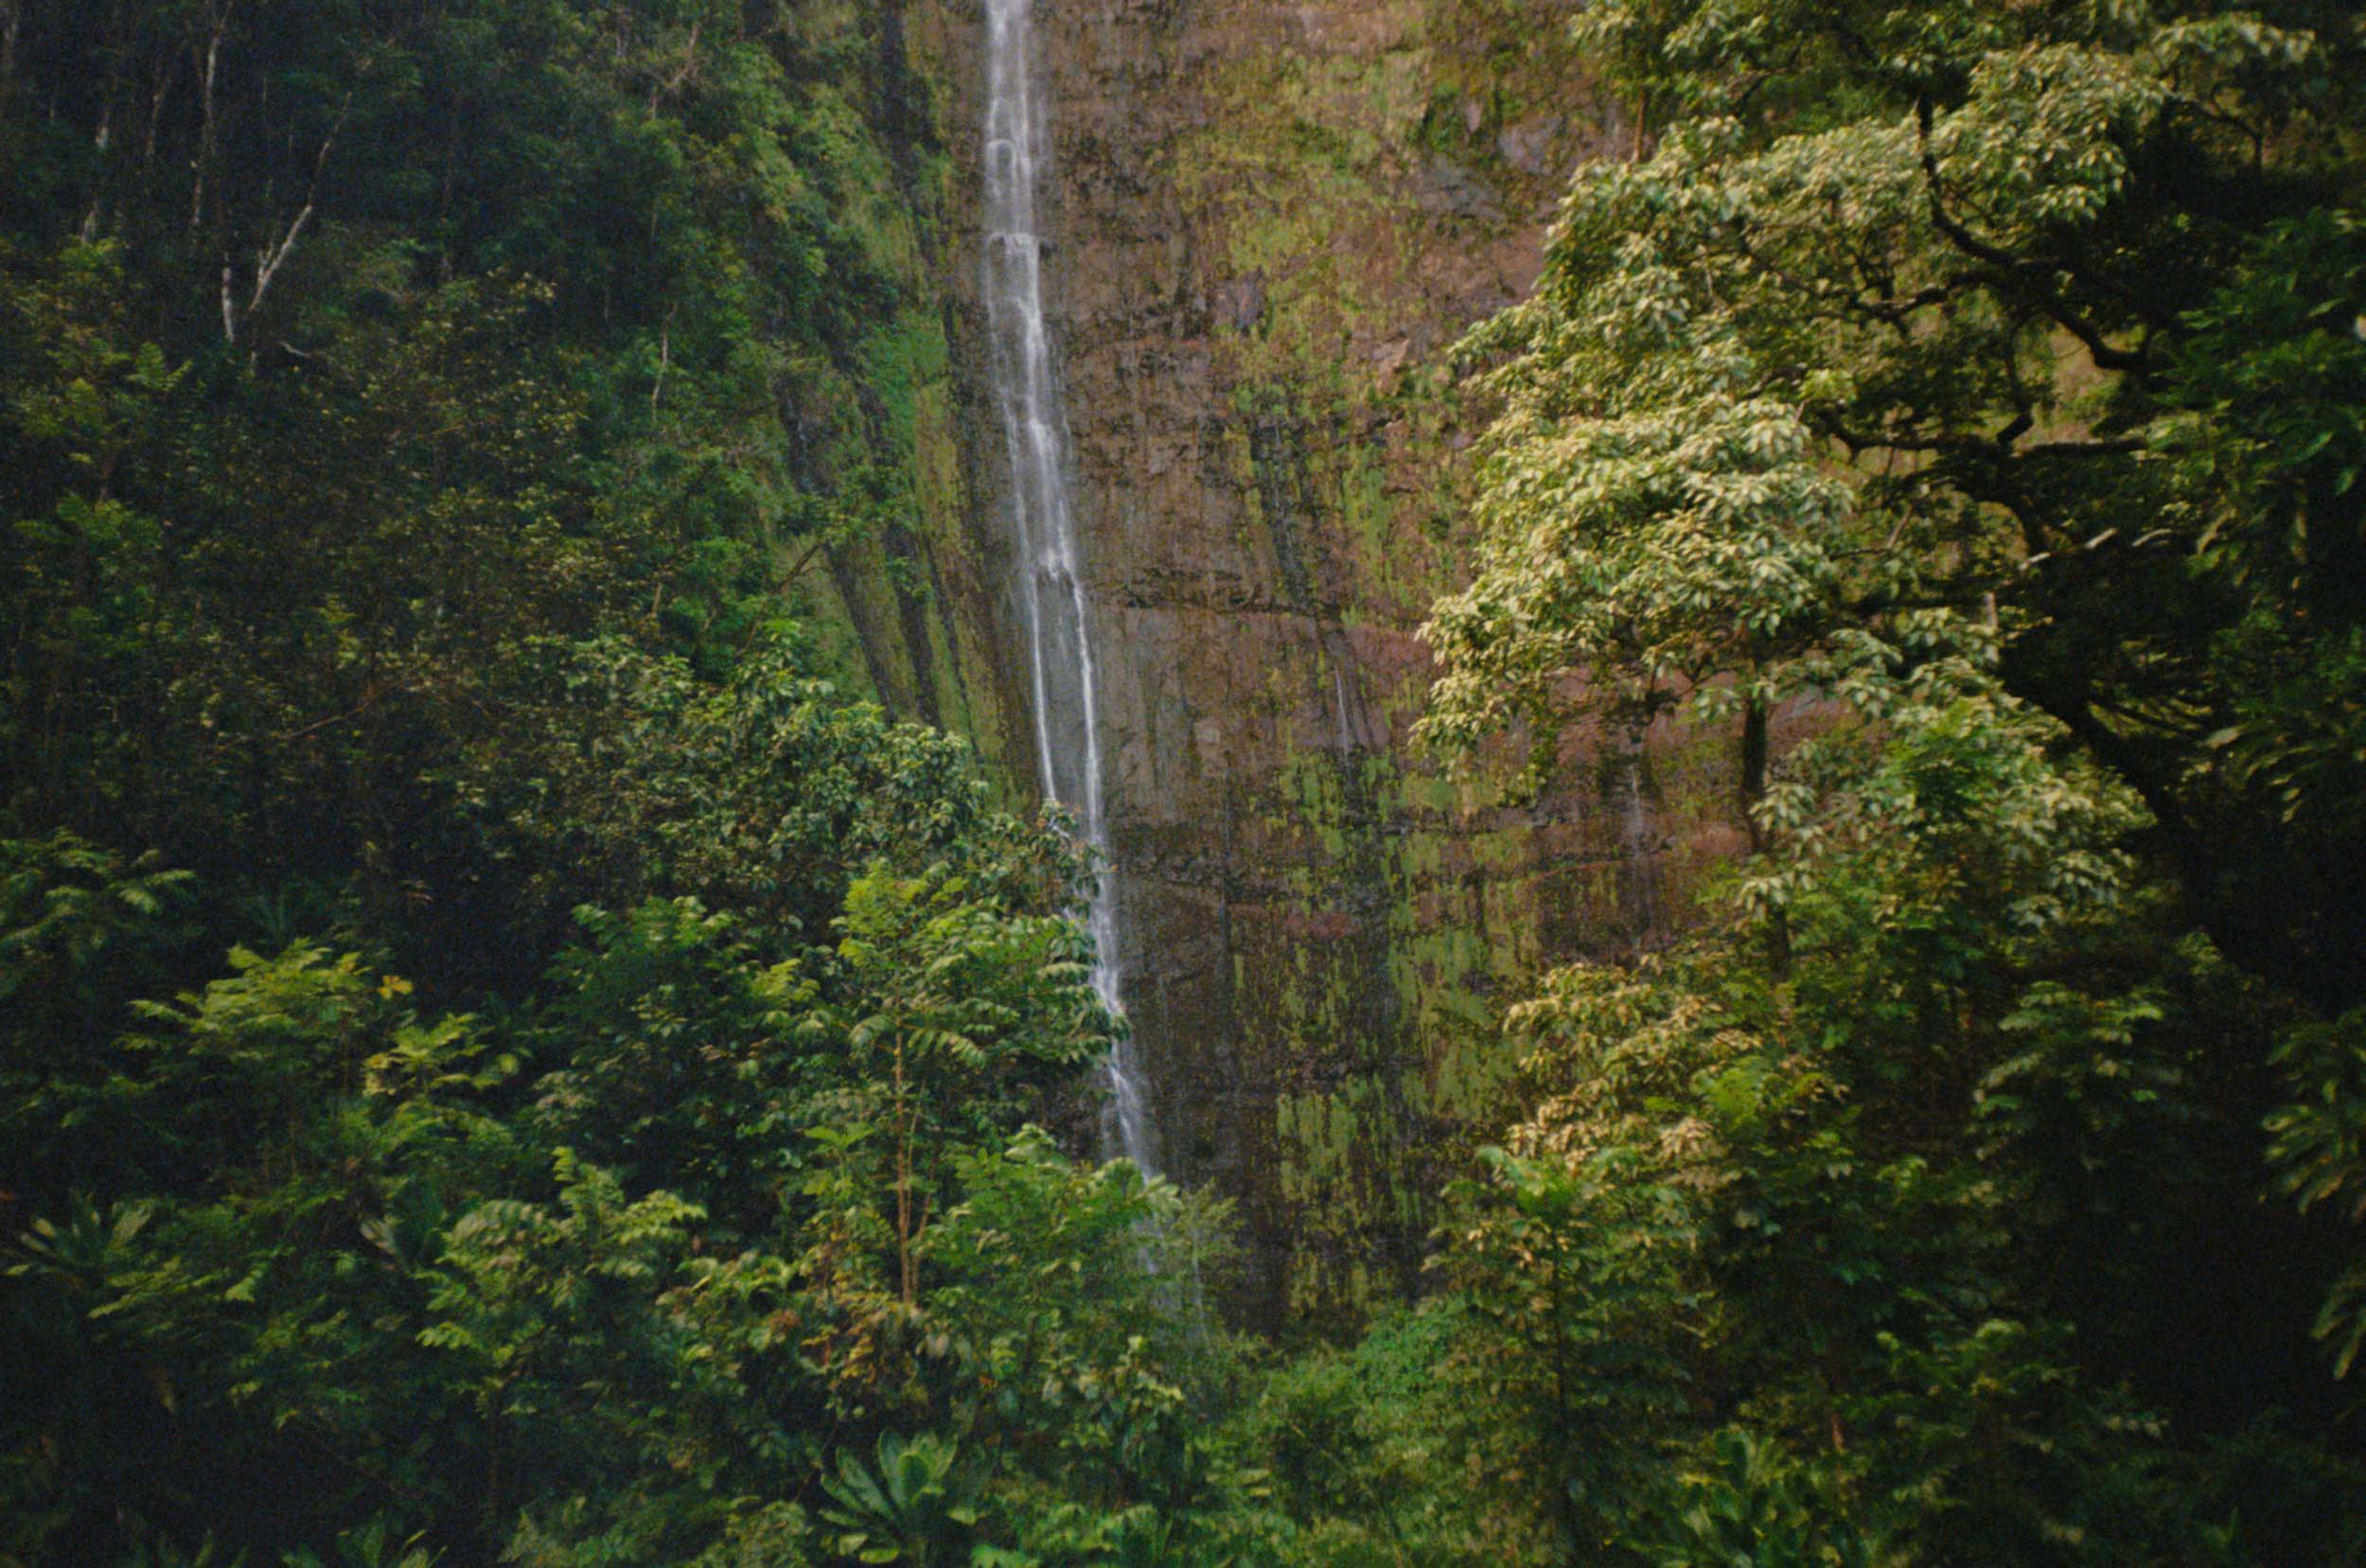 35mm_Maui-10.jpg